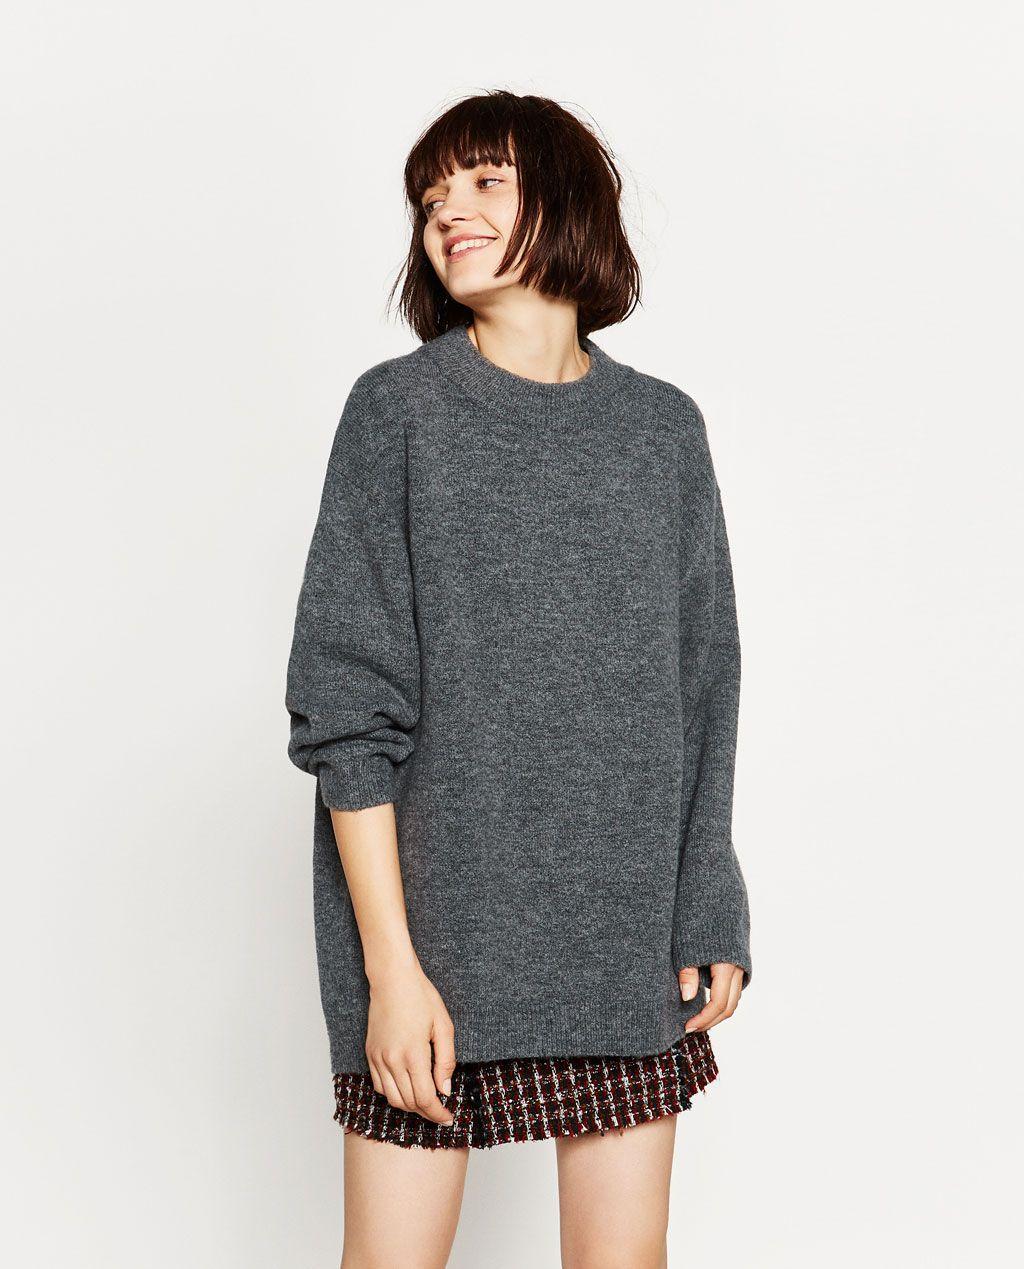 SOFT OVERSIZED SWEATER Sweaters KNITWEAR WOMAN   ZARA United